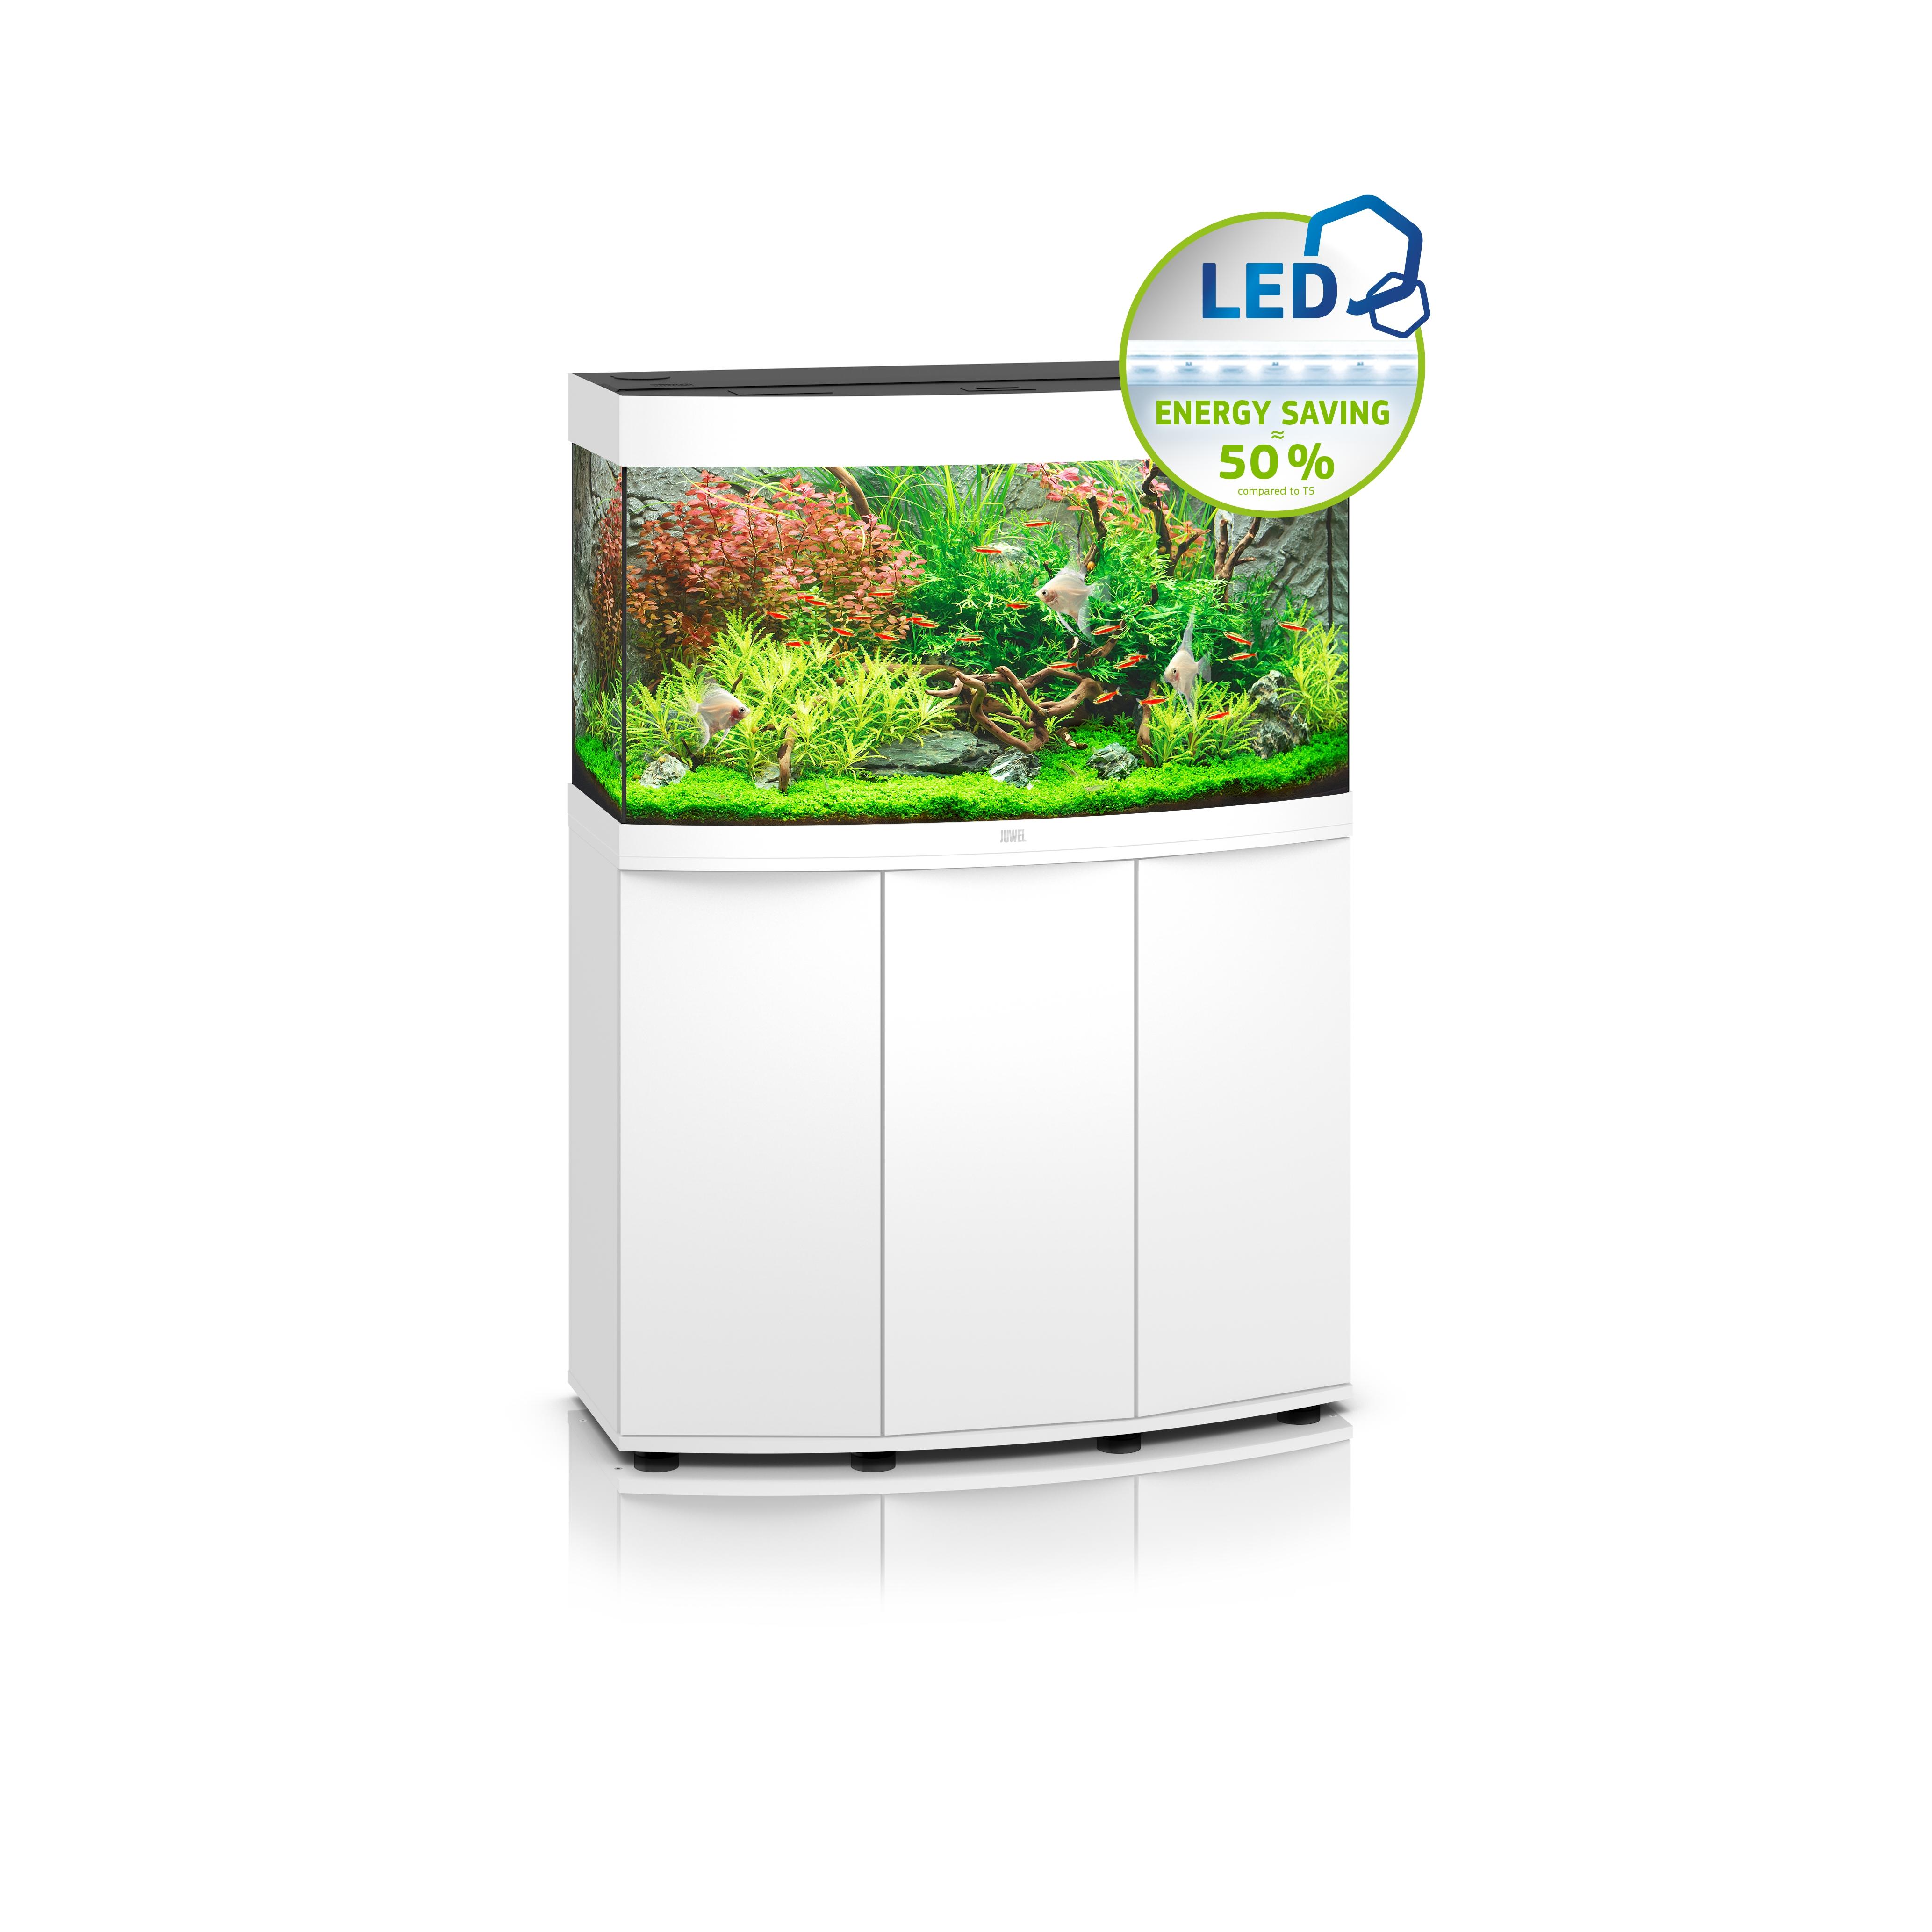 Aquarium Juwel Vision 180 LED Image